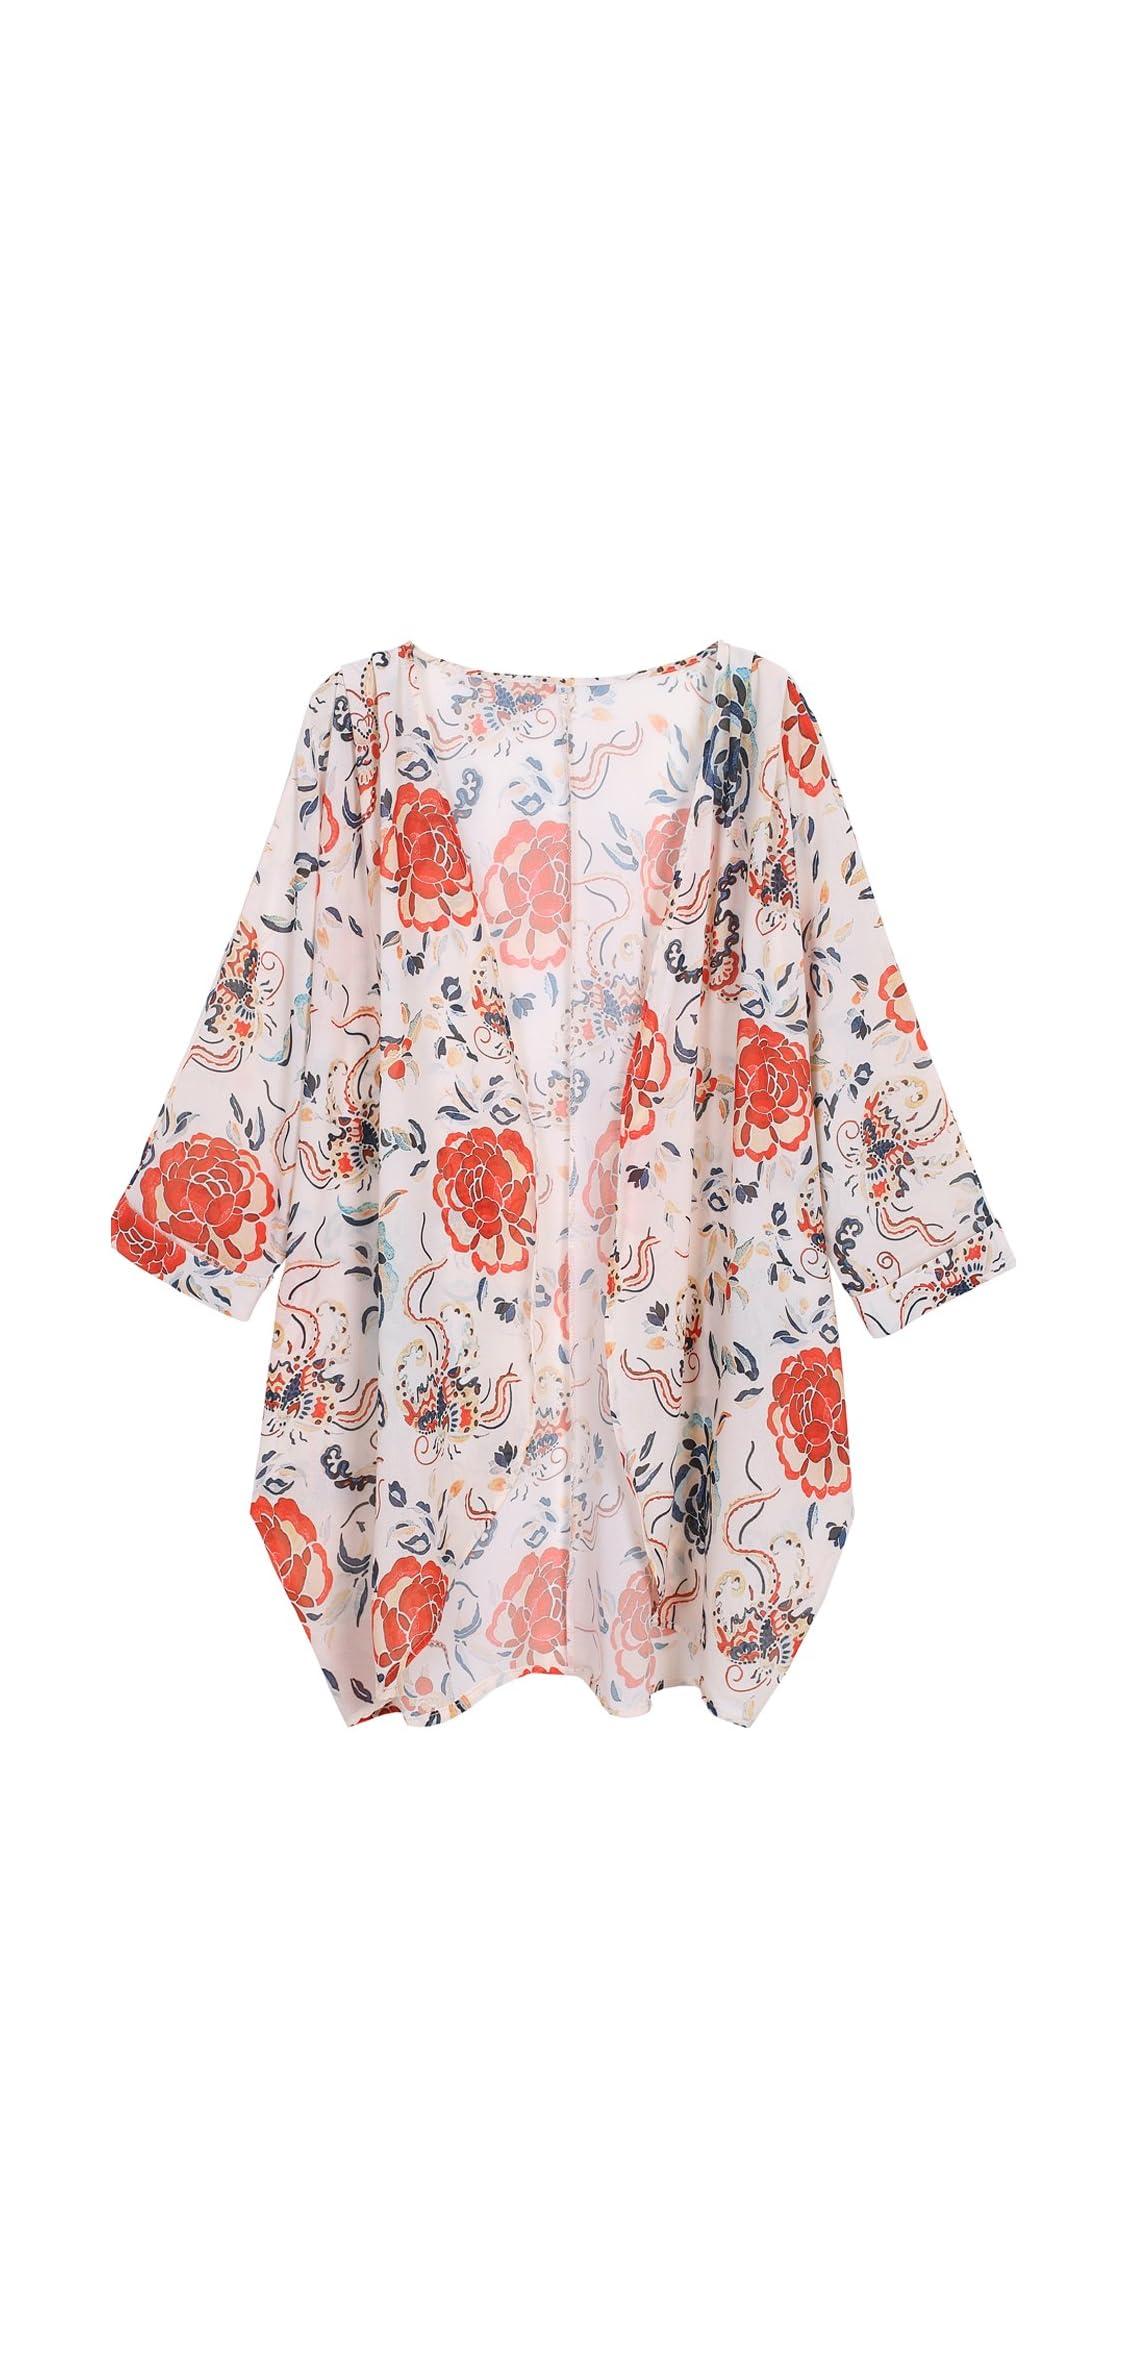 Women's Floral Print Sheer Chiffon Loose Kimono Cardigan